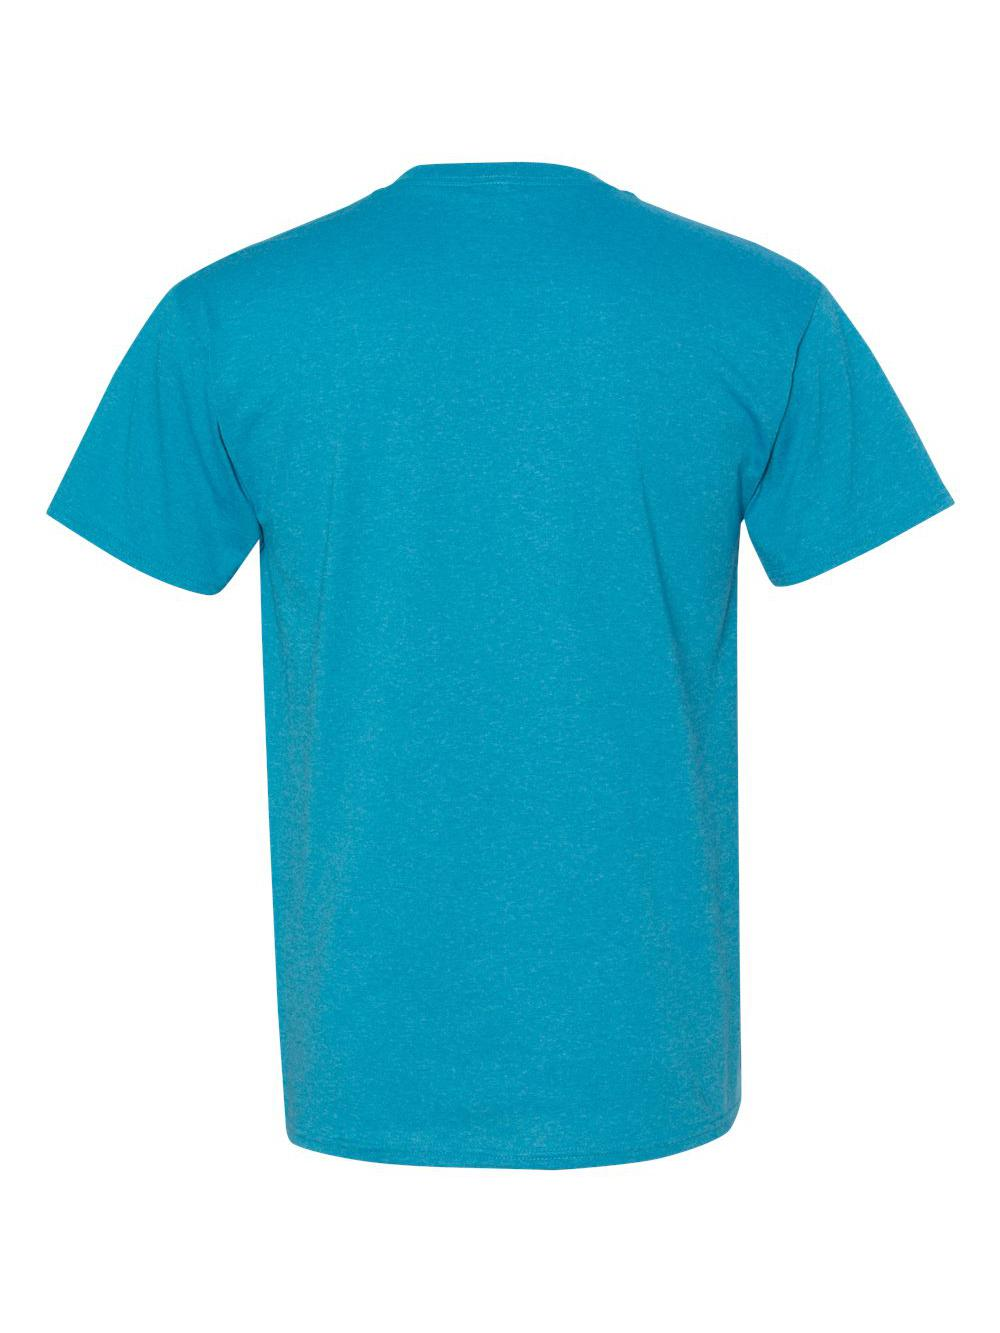 Fruit-of-the-Loom-HD-Cotton-Short-Sleeve-T-Shirt-3930R thumbnail 136